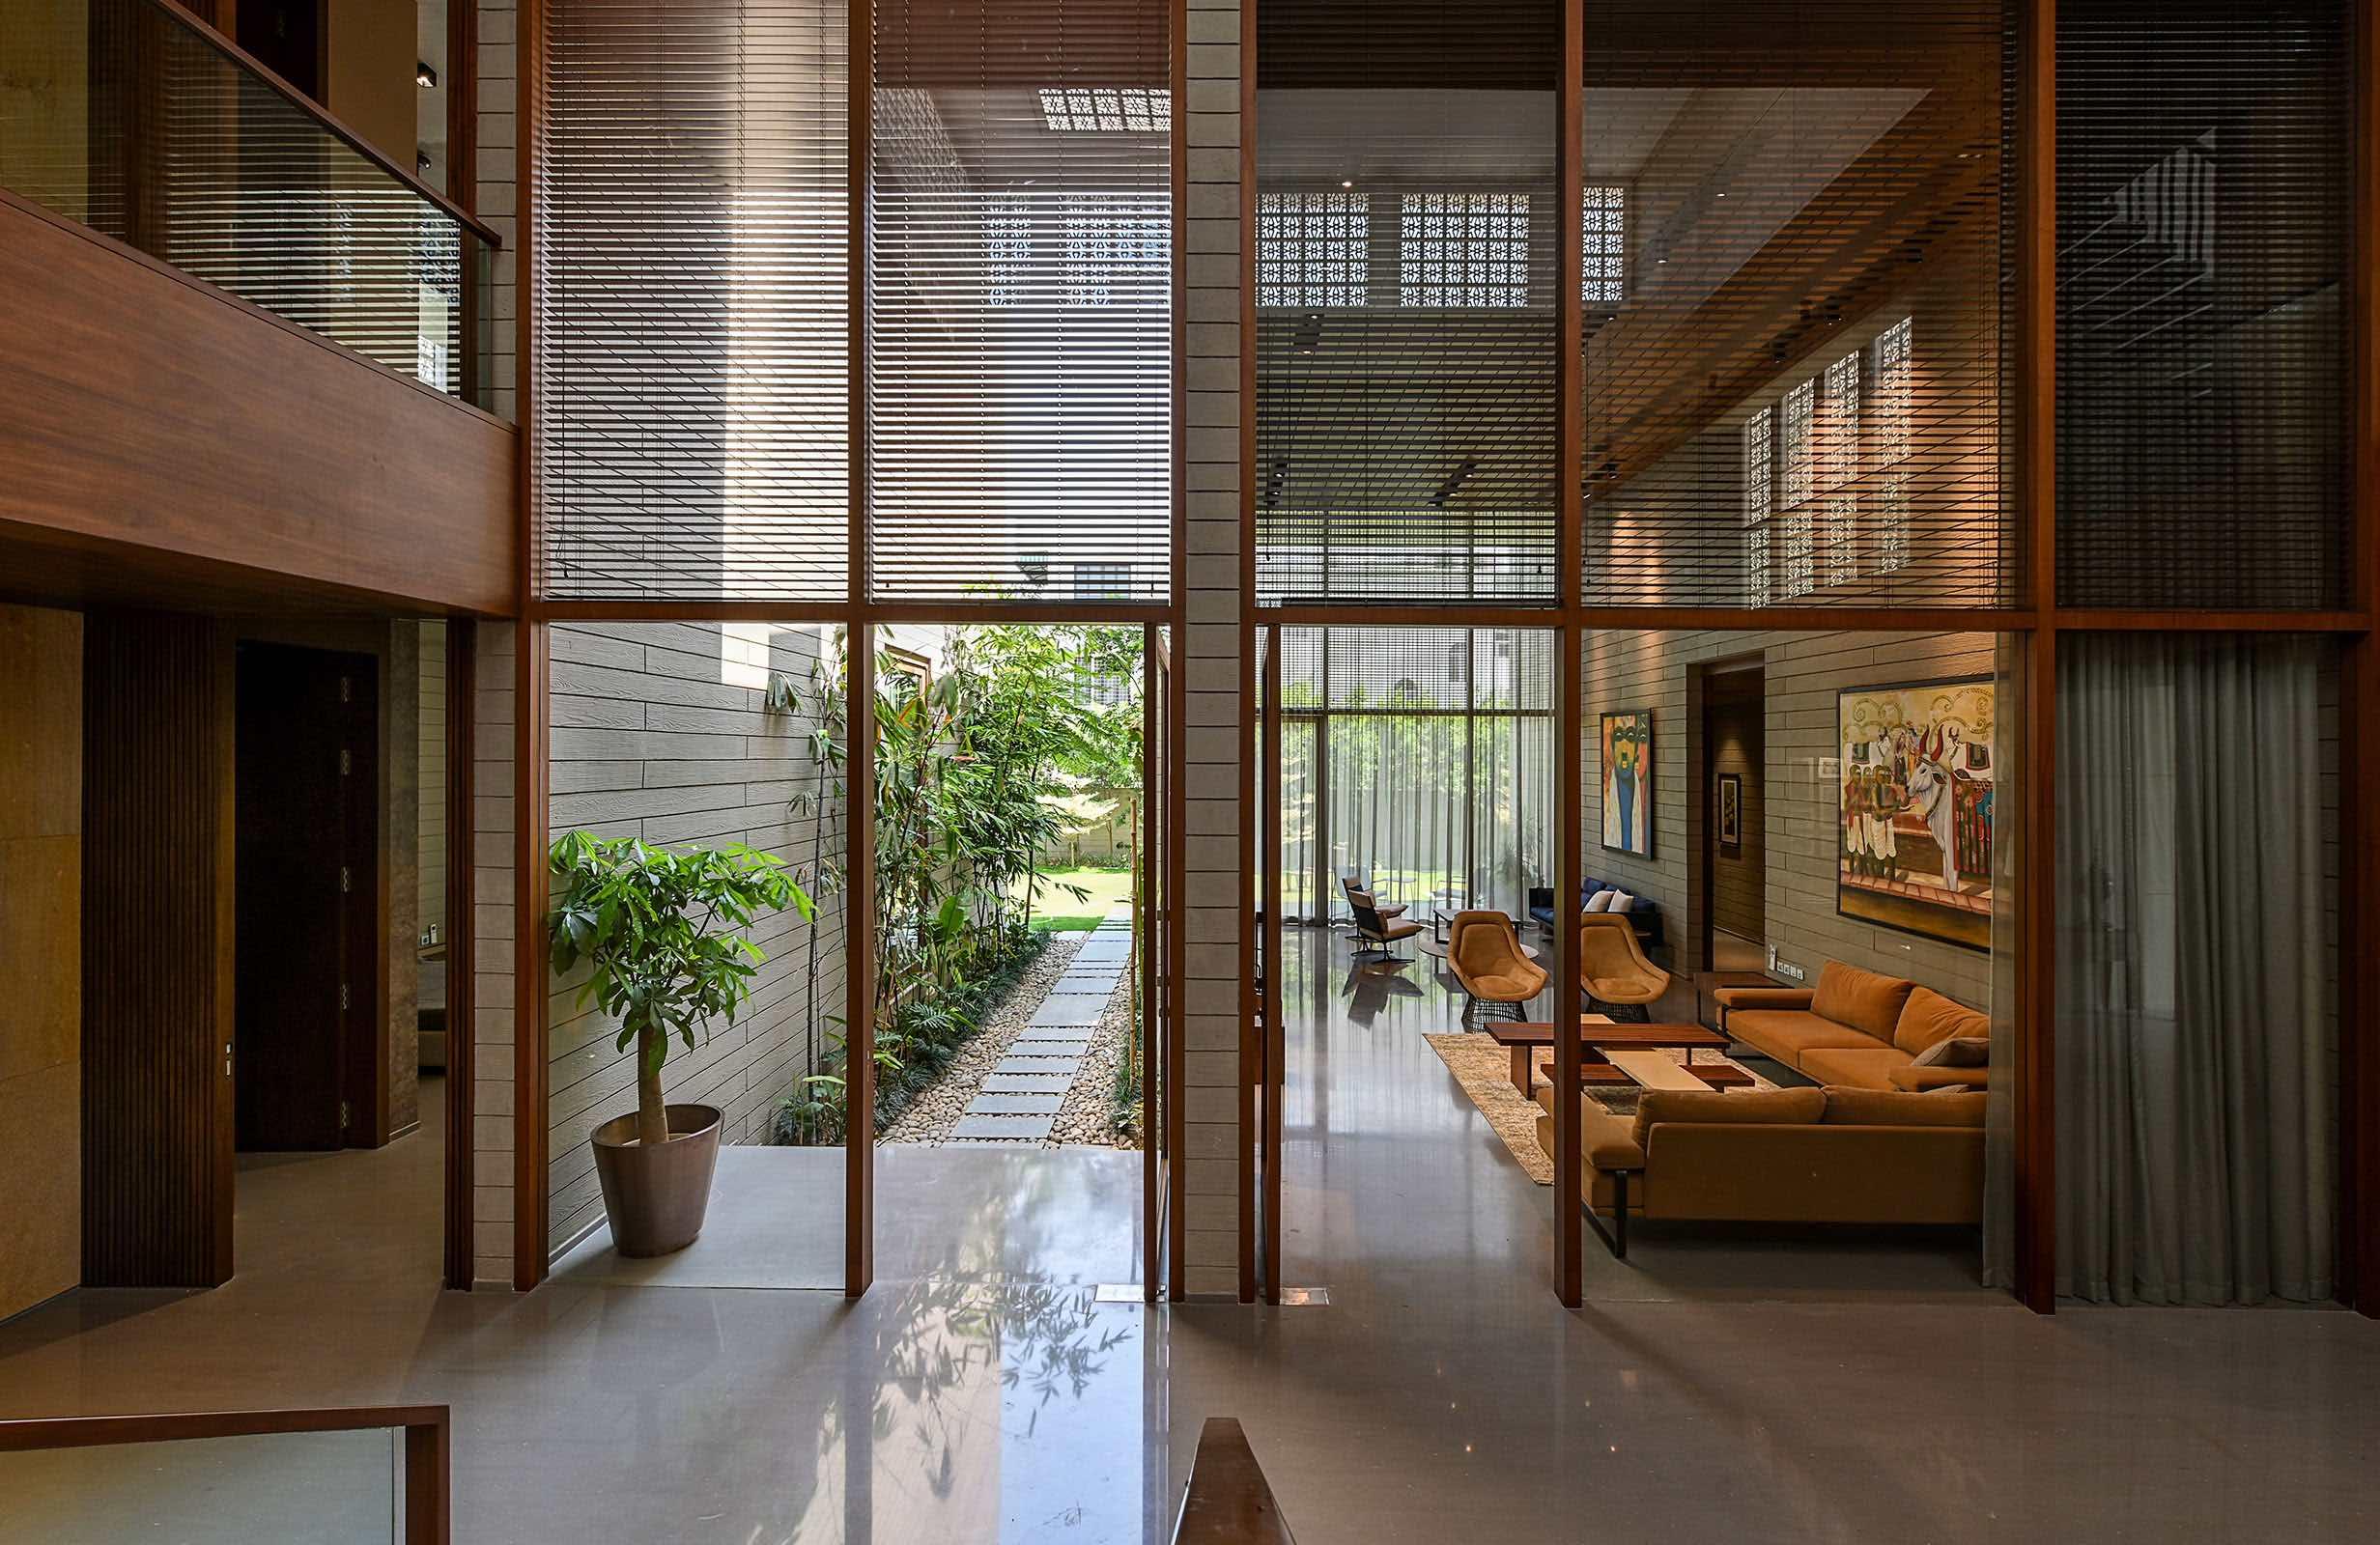 18_Screens_Sanjay_Puri_architects_india_amazingarchitecture_009.jpg